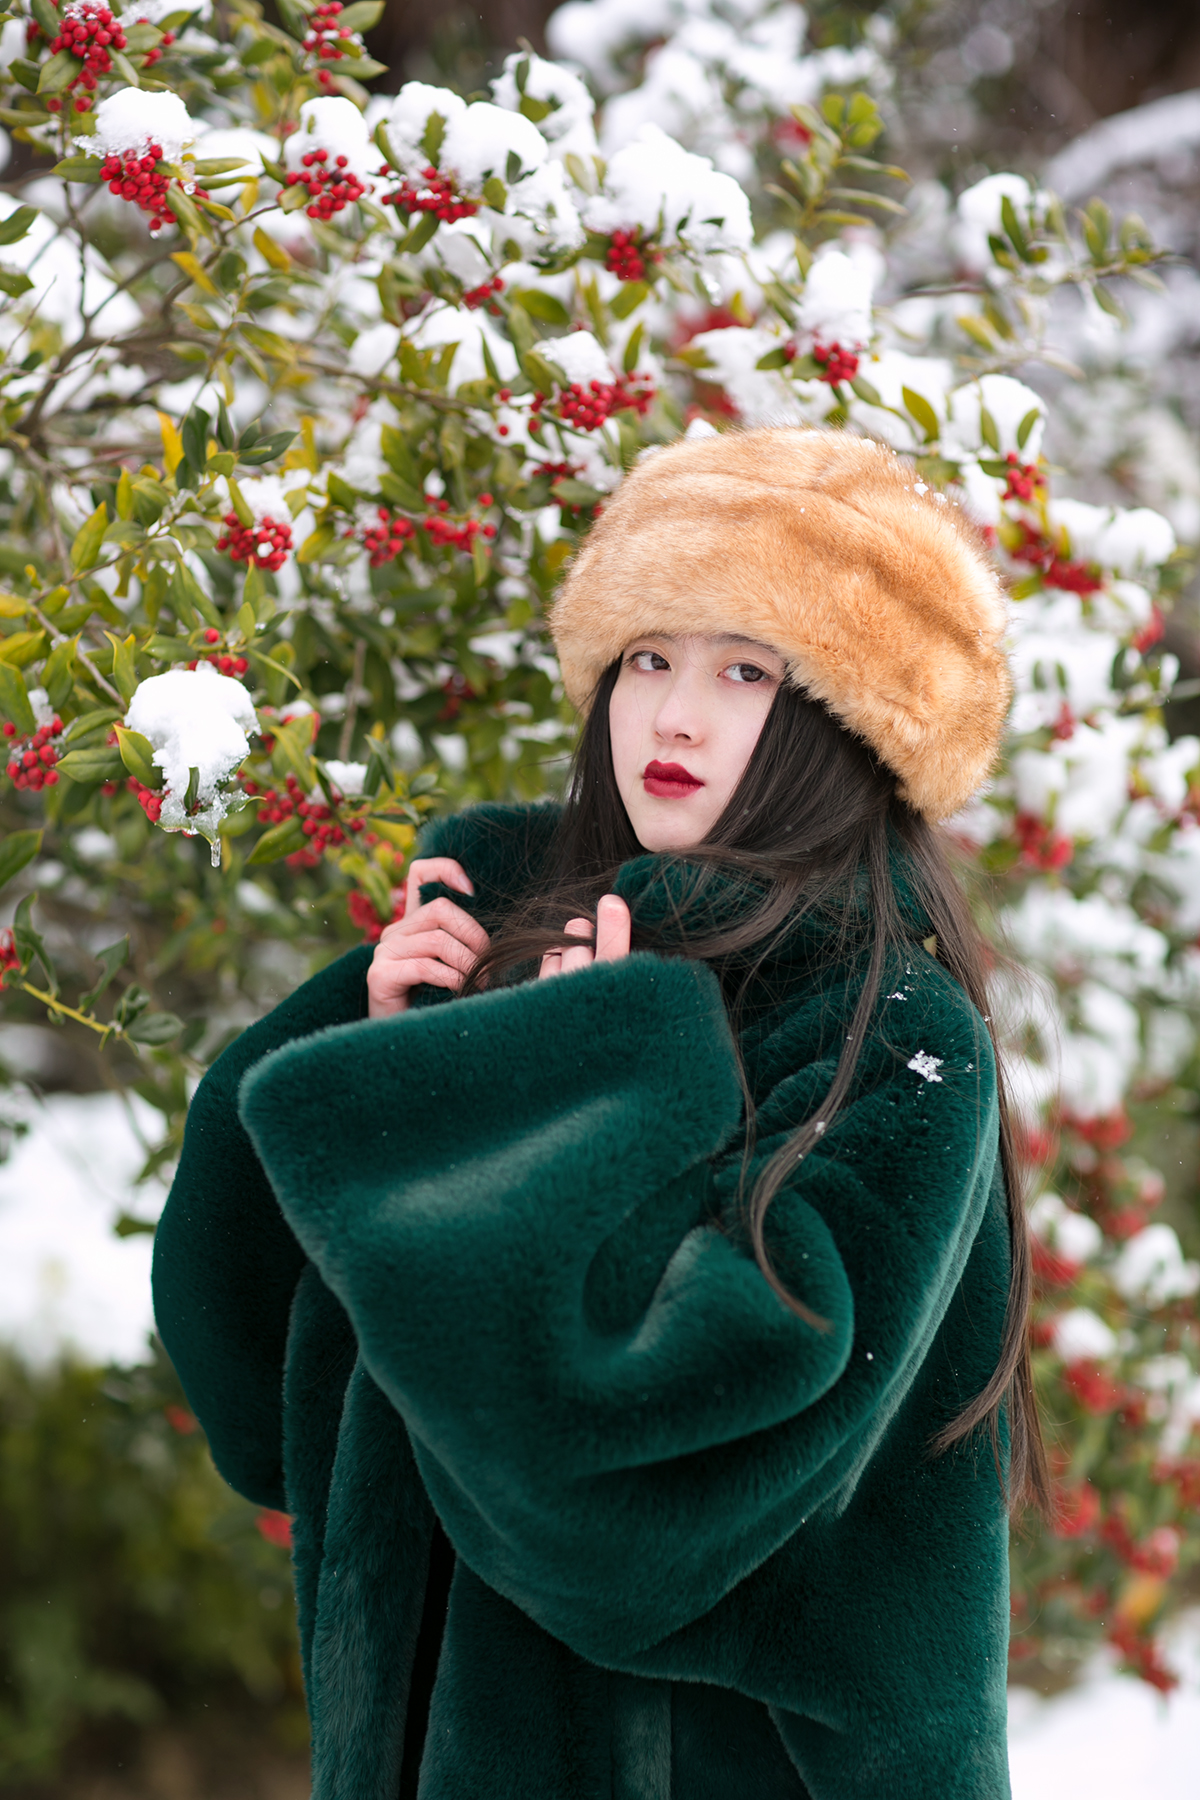 Oversize Overcaot Manteau 2018 Femme Fourrure dark Femmes Fausse Beige Vestes New Manteaux pink Luxe Lapin En Winter De Chaqueta Green Chaud Fluffy Mujer xfqaSpOa